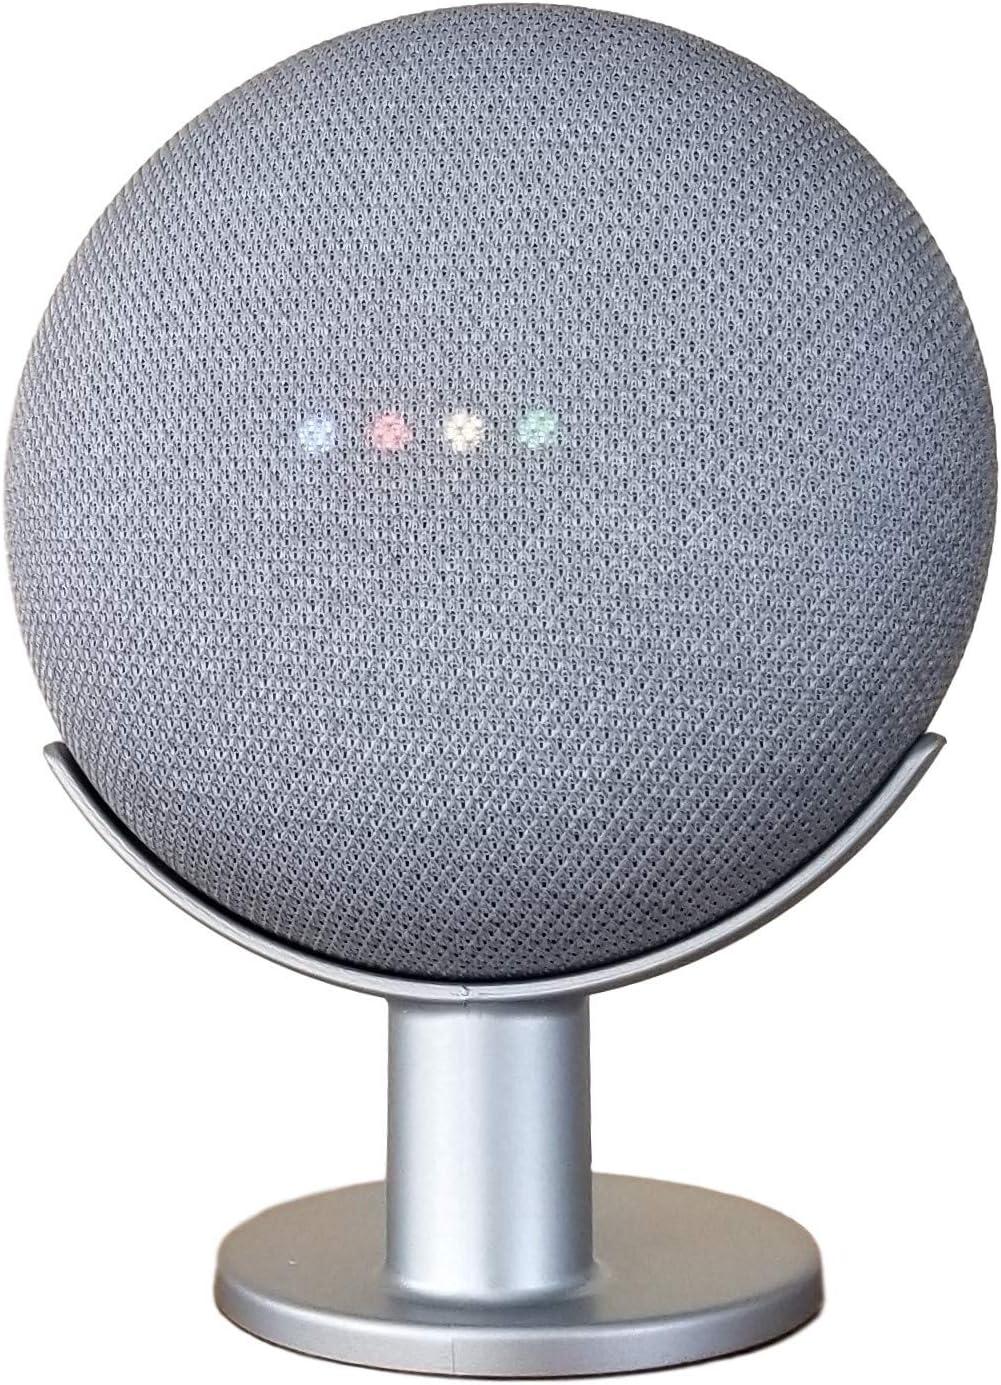 Soporte Stand Para Google Home Mini plateado